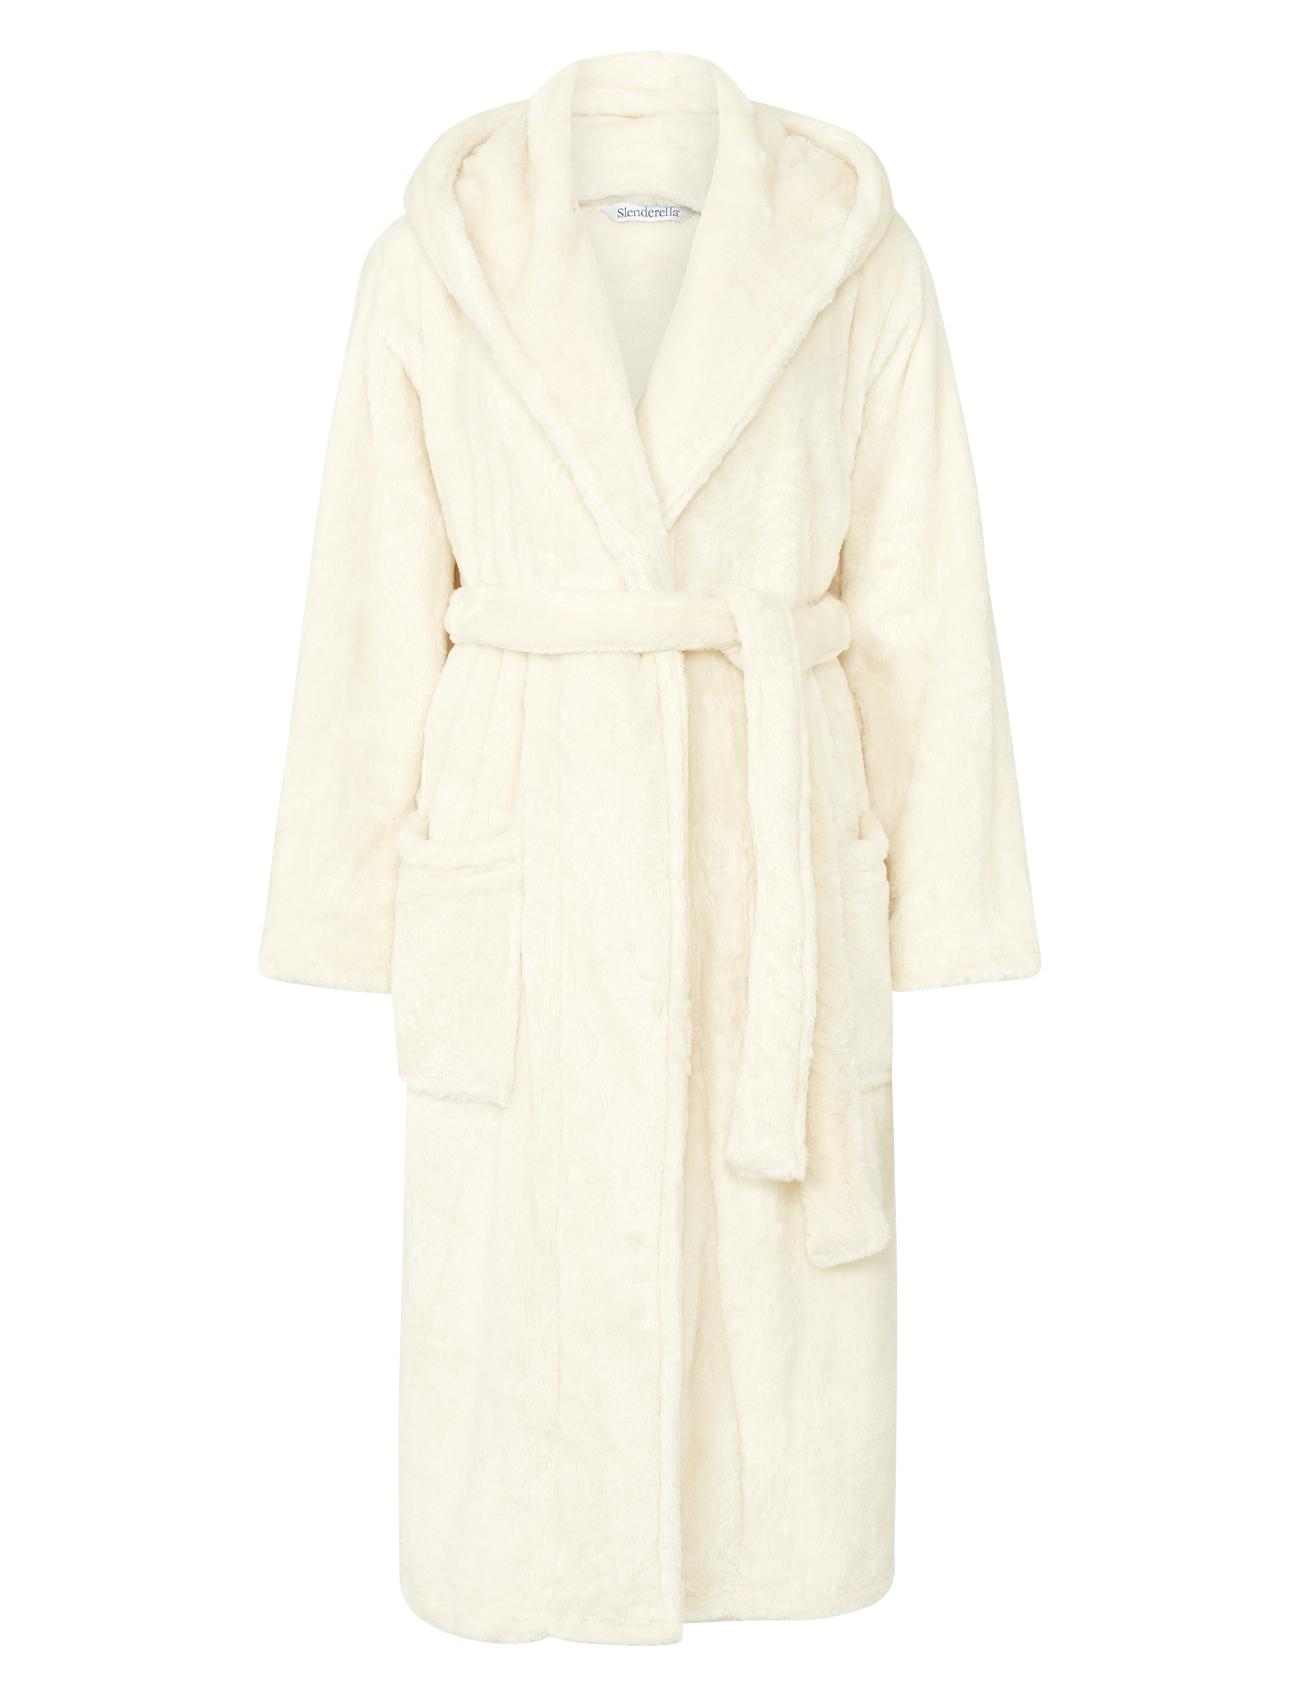 Slenderella Ladies Super Soft Thick Fleece Dressing Gown Luxury ... cca2d47e7